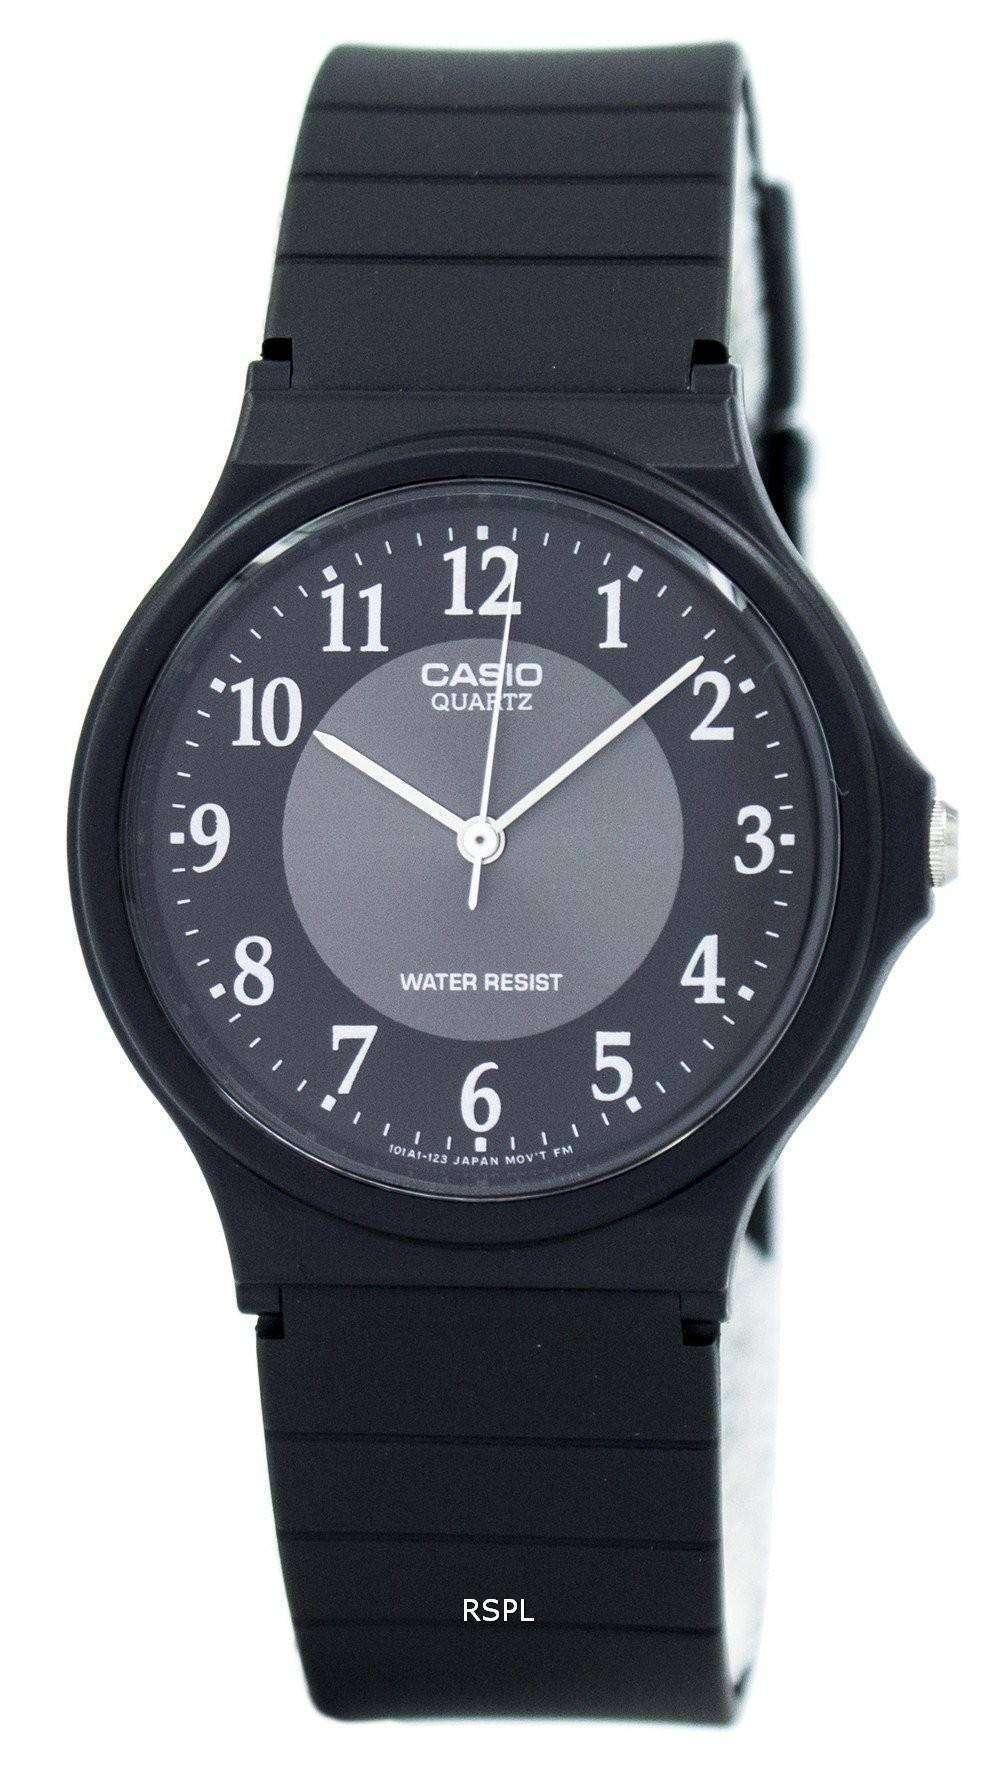 e53375e1e868 Reloj Casio clásico analógico de cuarzo negro resina MQ-24-1B3LDF MQ ...